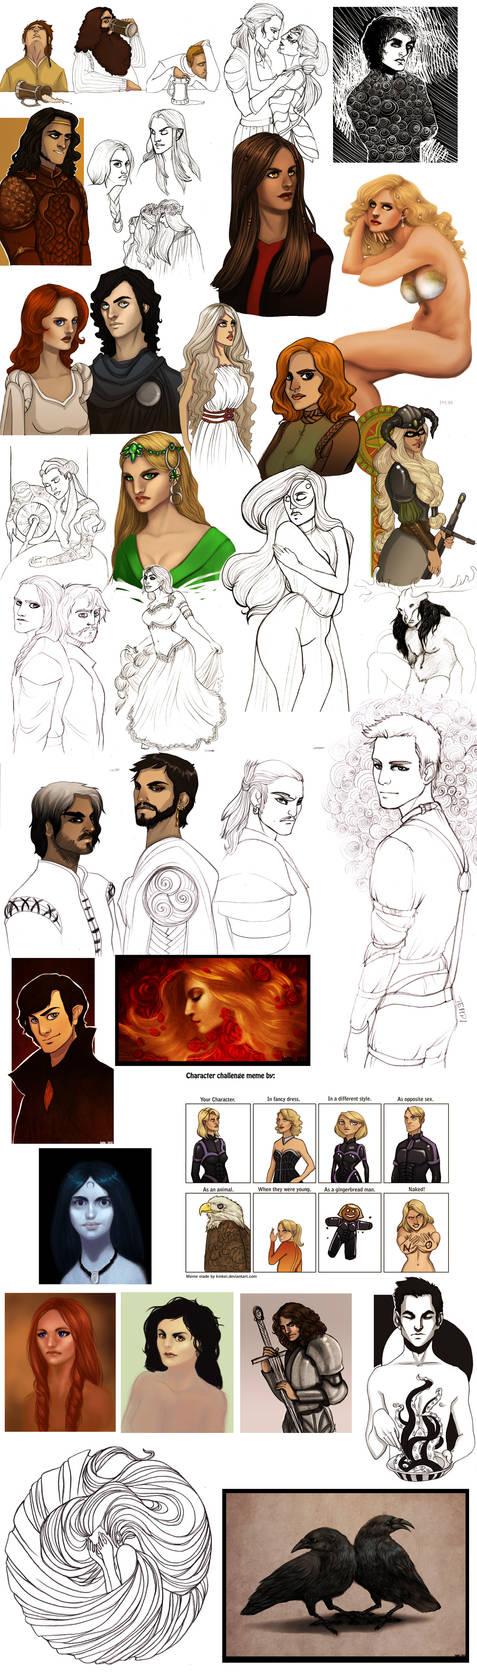 Sketchdump II